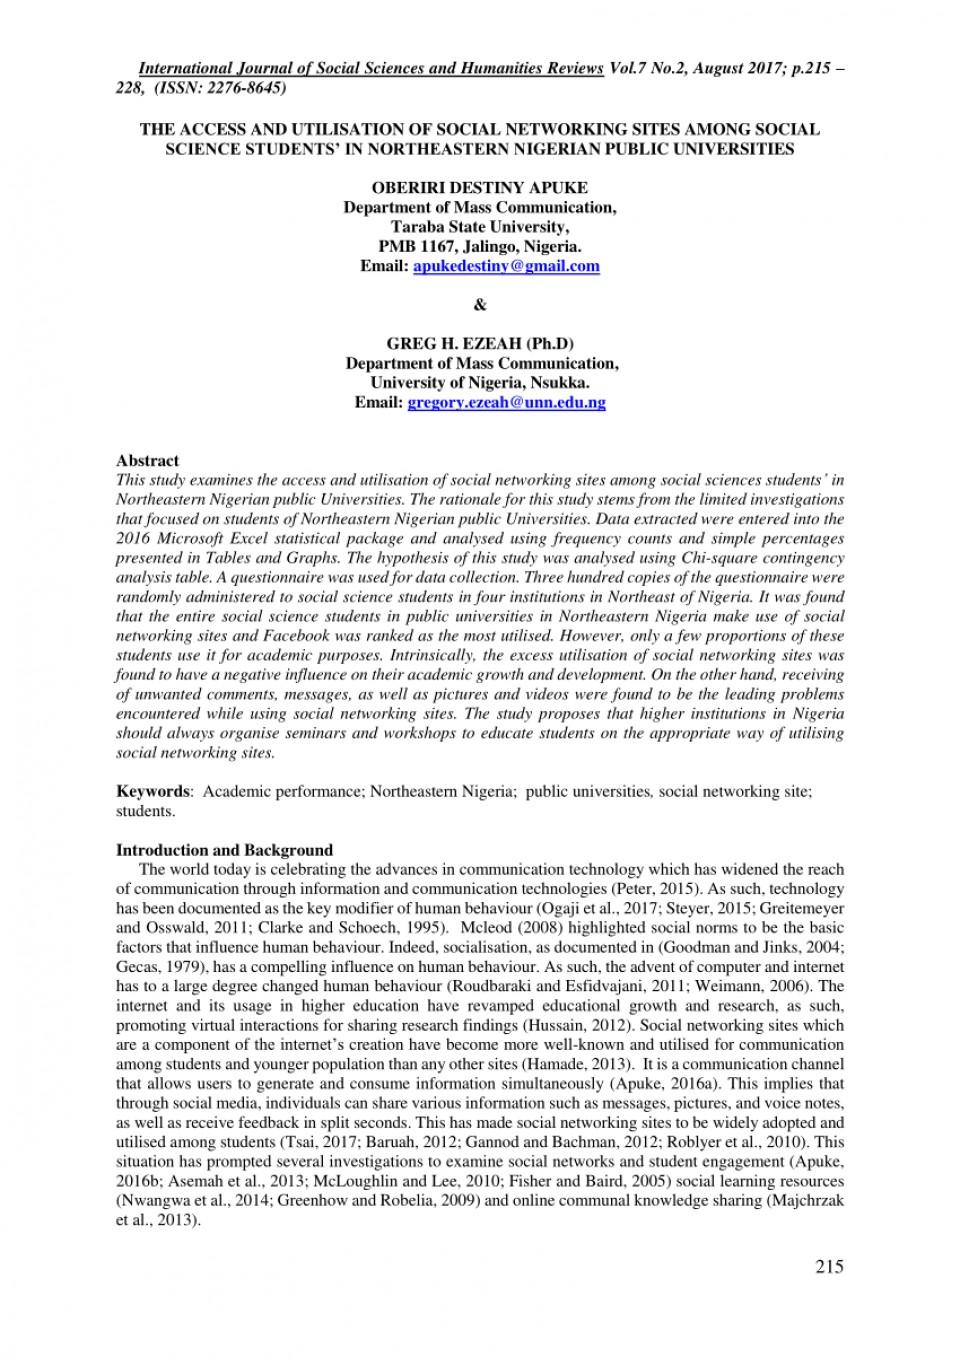 Research proposal for an undergraduate business studies dissertation